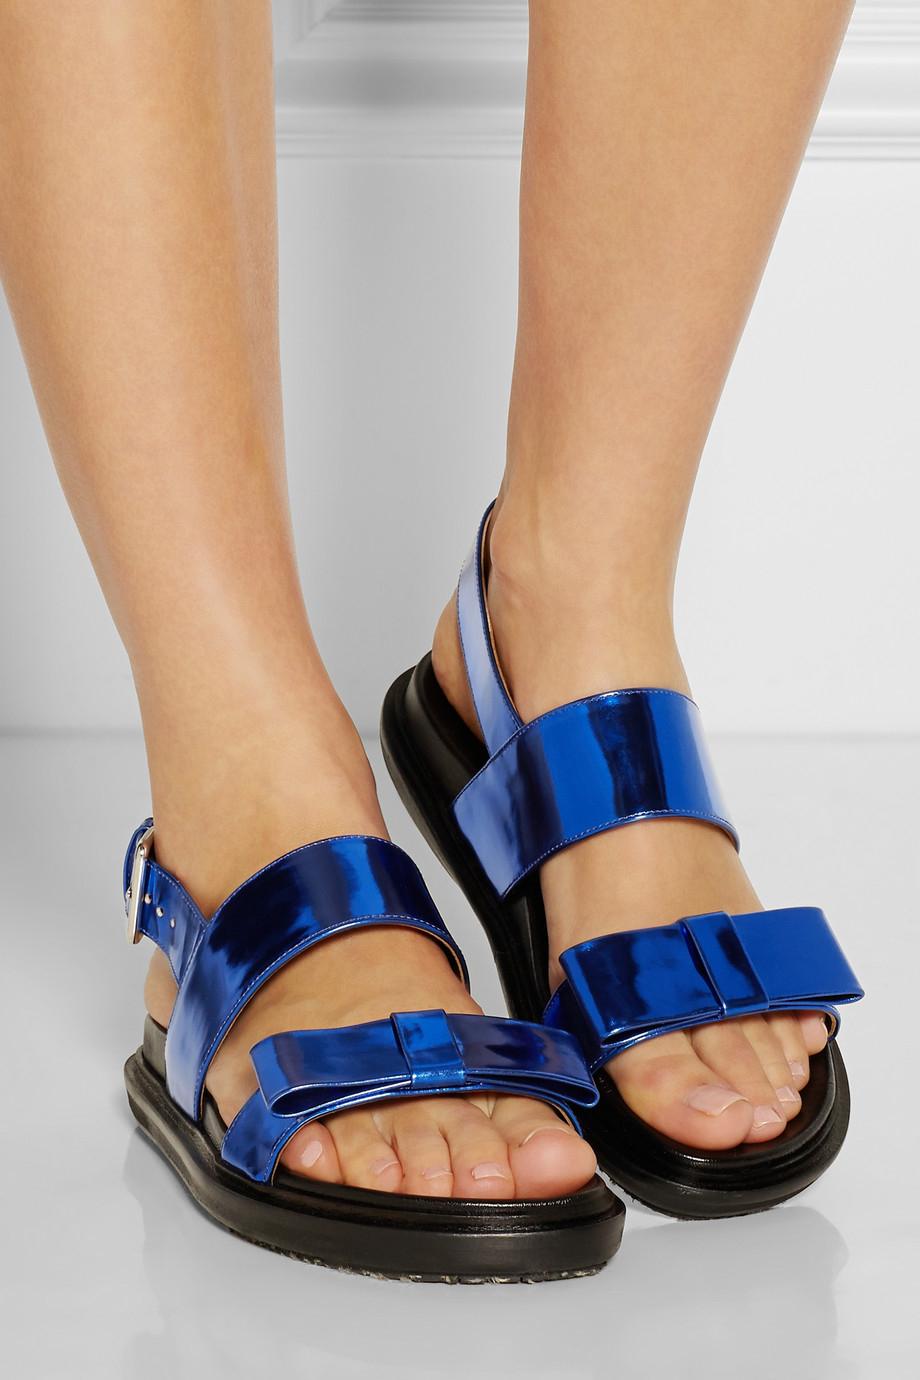 Lyst Marni Metallic Leather Sandals In Blue